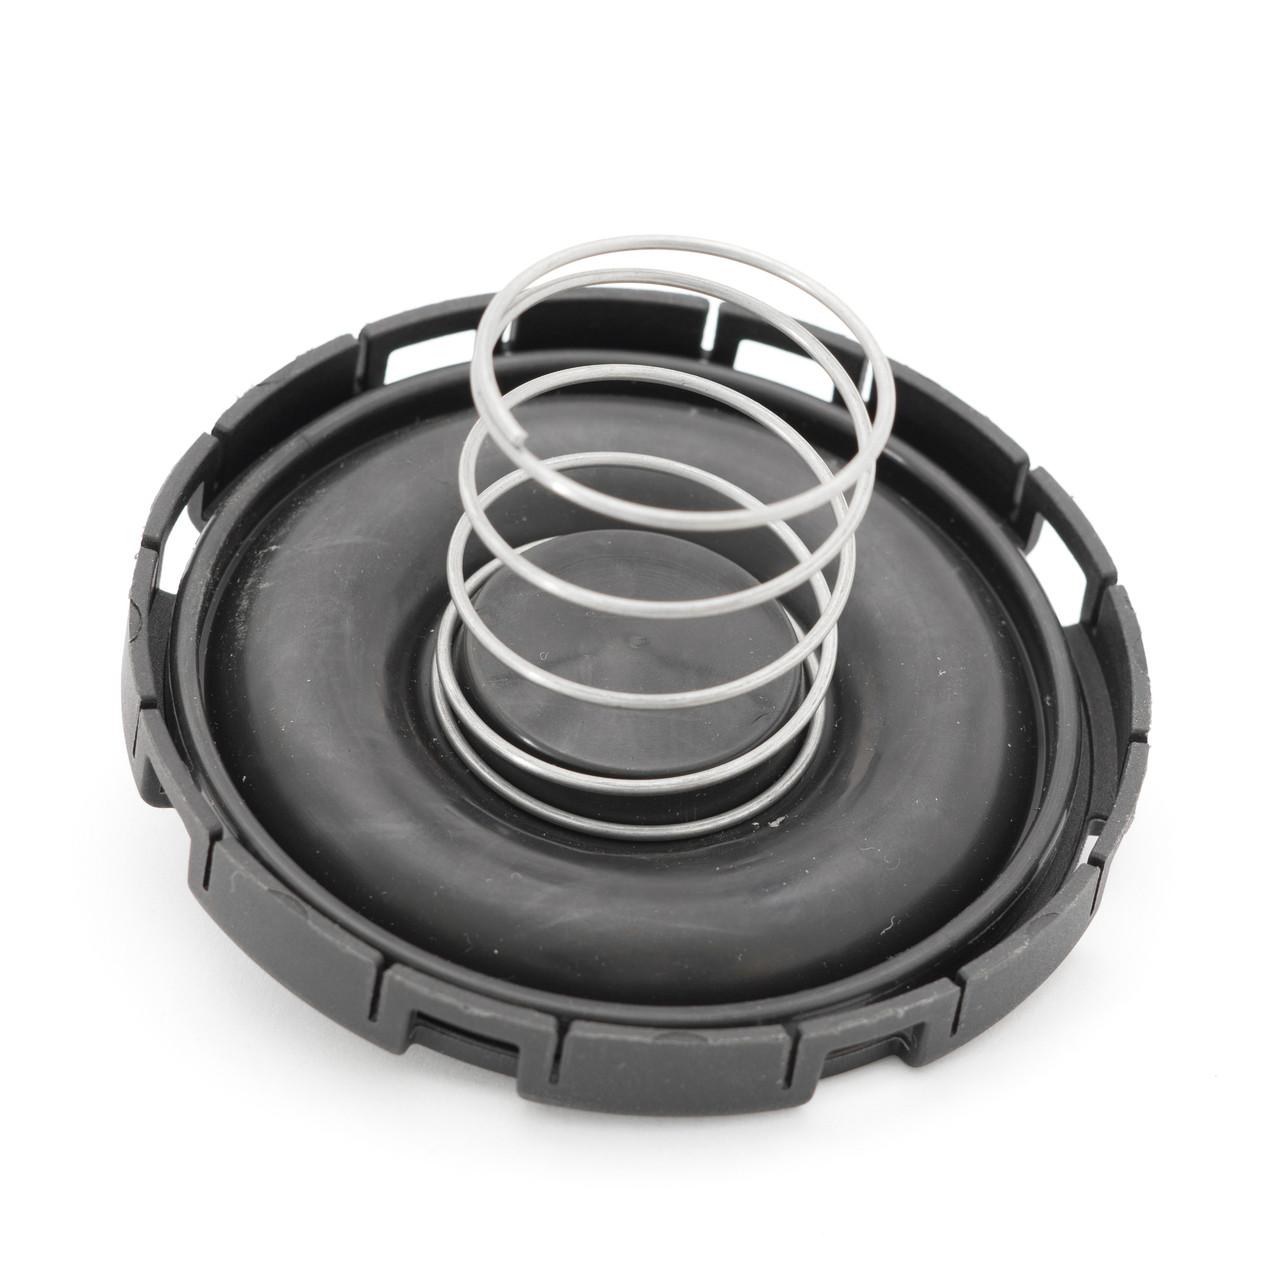 Клапан вентиляции картерных газов для BMW N57 N57N 11127823181